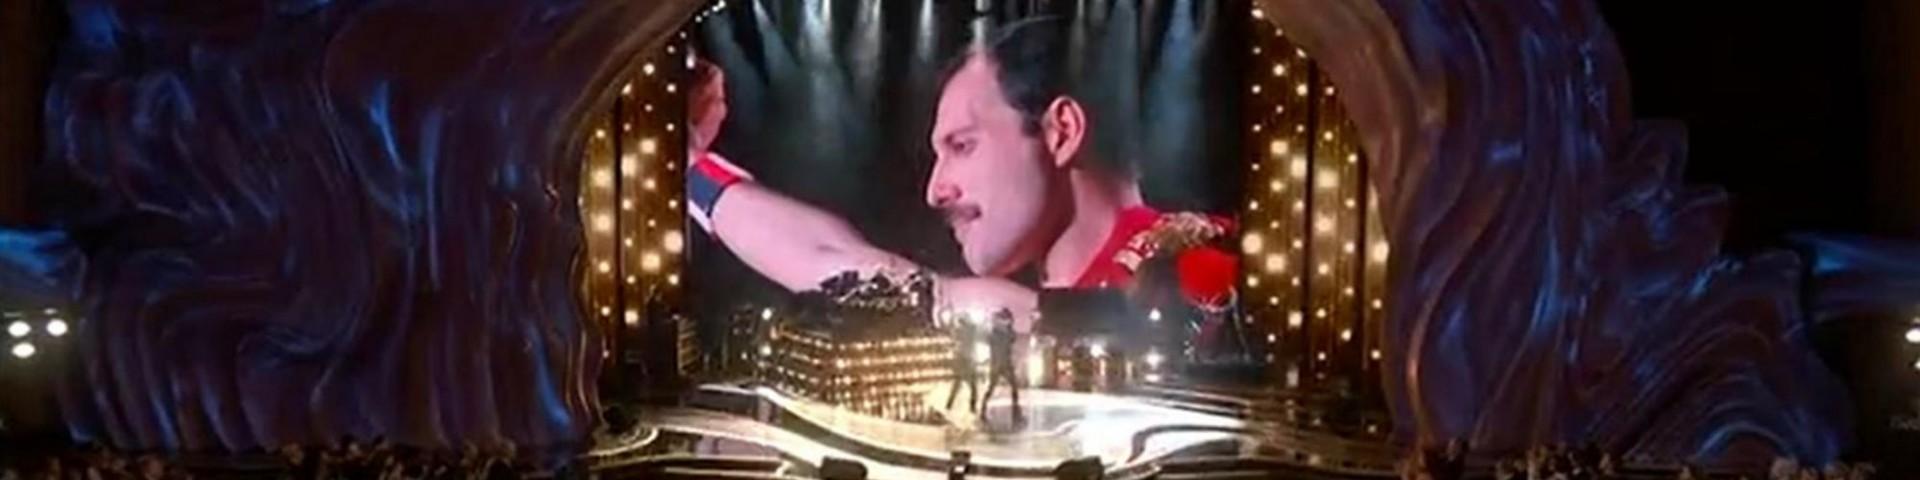 Oscar 2019: Queen e Adam Lambert aprono la serata - Video